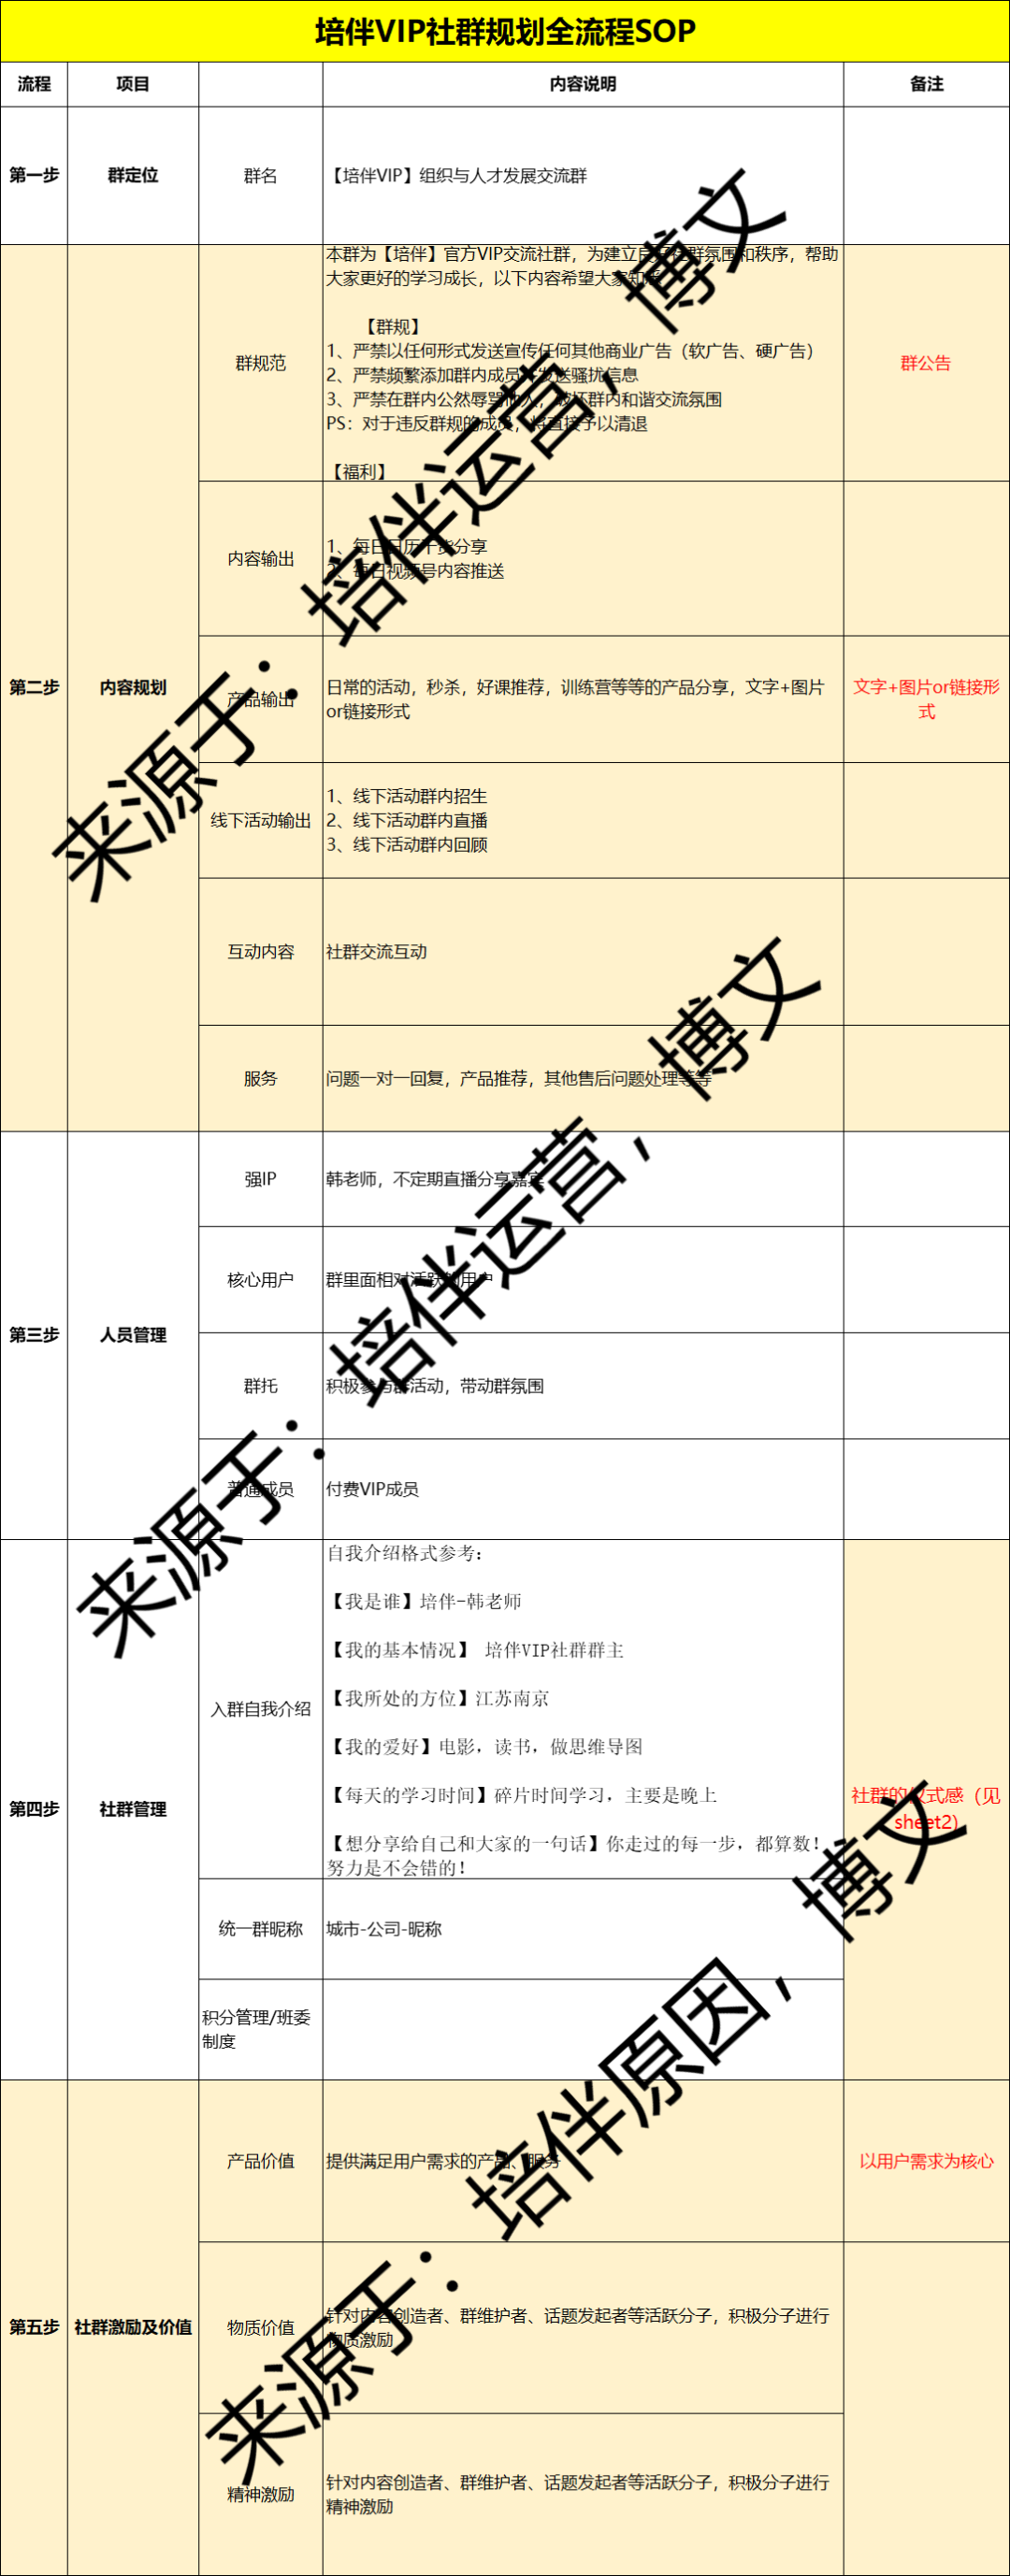 89FE5rXt63h25Rh46nQG 社群运营实操手册:带你从入门到寂寞